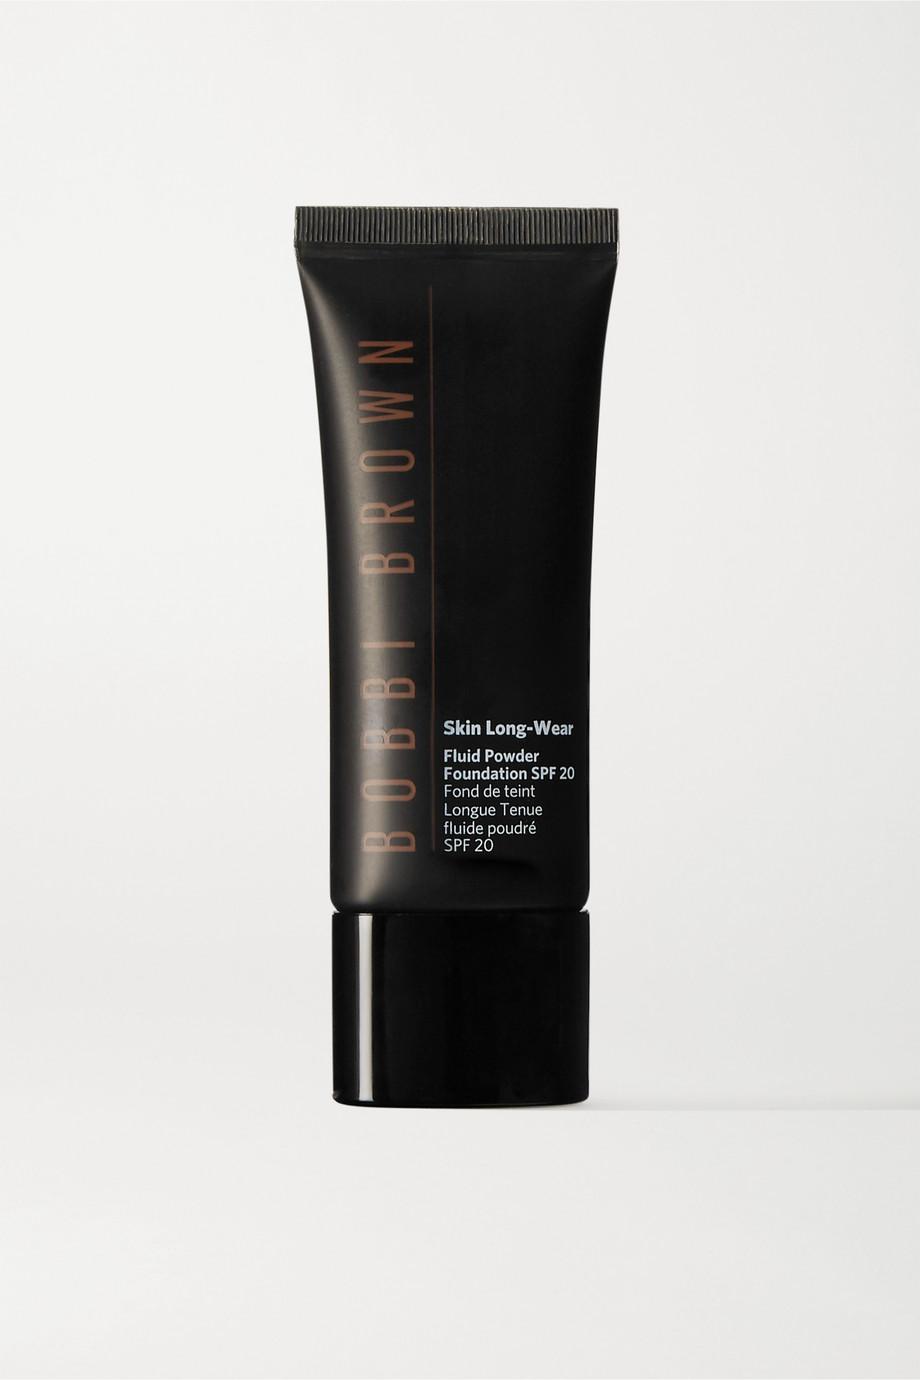 Bobbi Brown Fond de teint Skin Long-Wear Fluid Powder SPF 20, Espresso